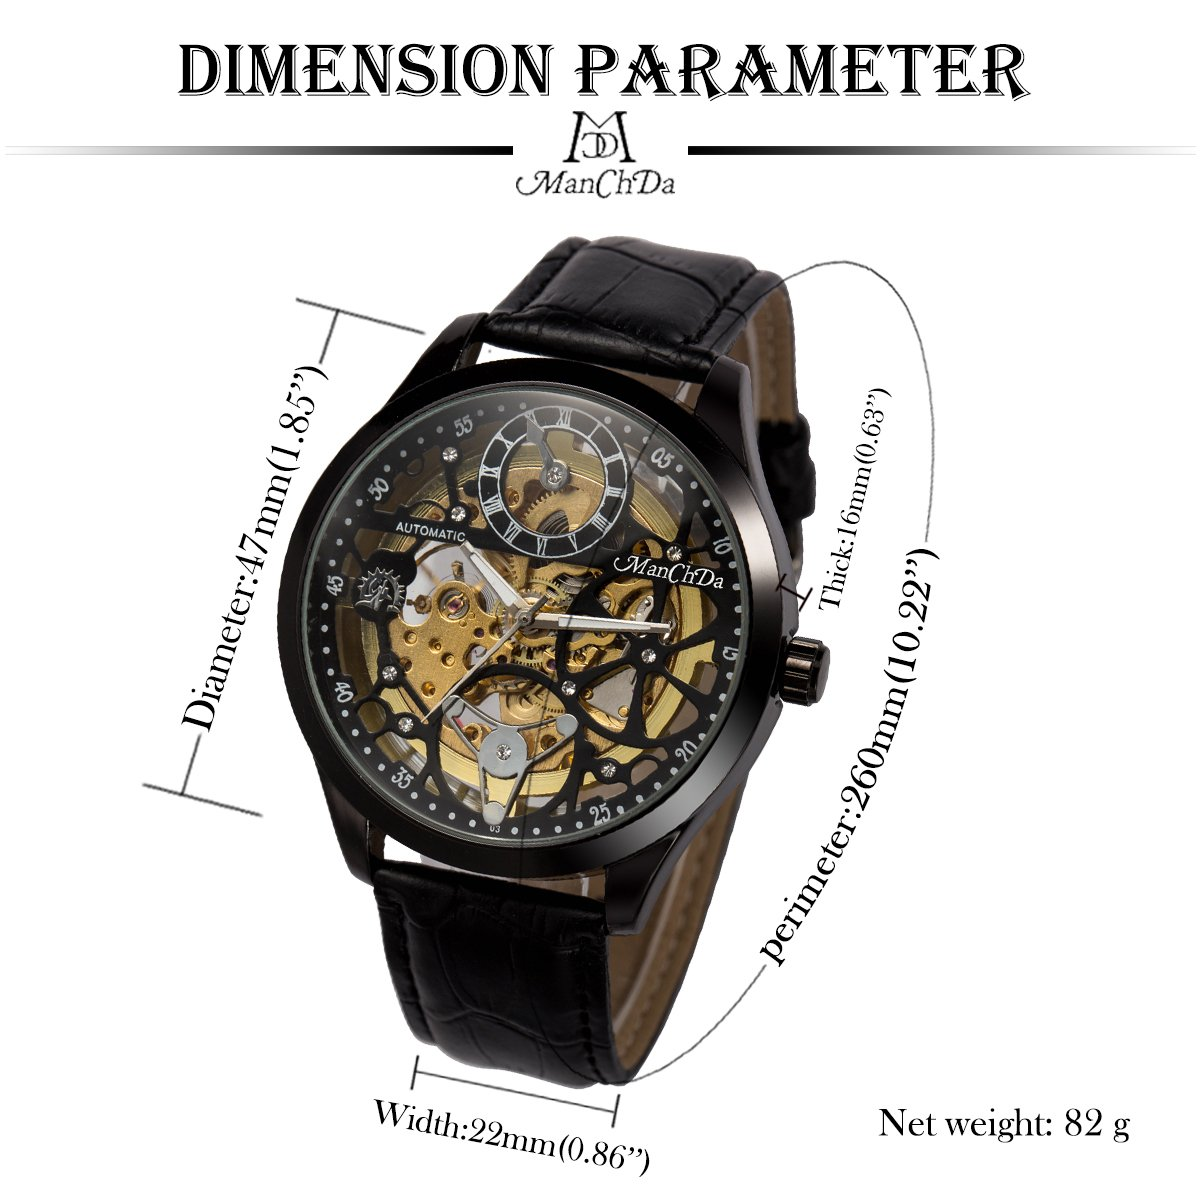 ManChDa Big Case 47MM XL Automatic Mechanical Crystal Black Leather Wrist Watch + Gift Box by ManChDa (Image #5)